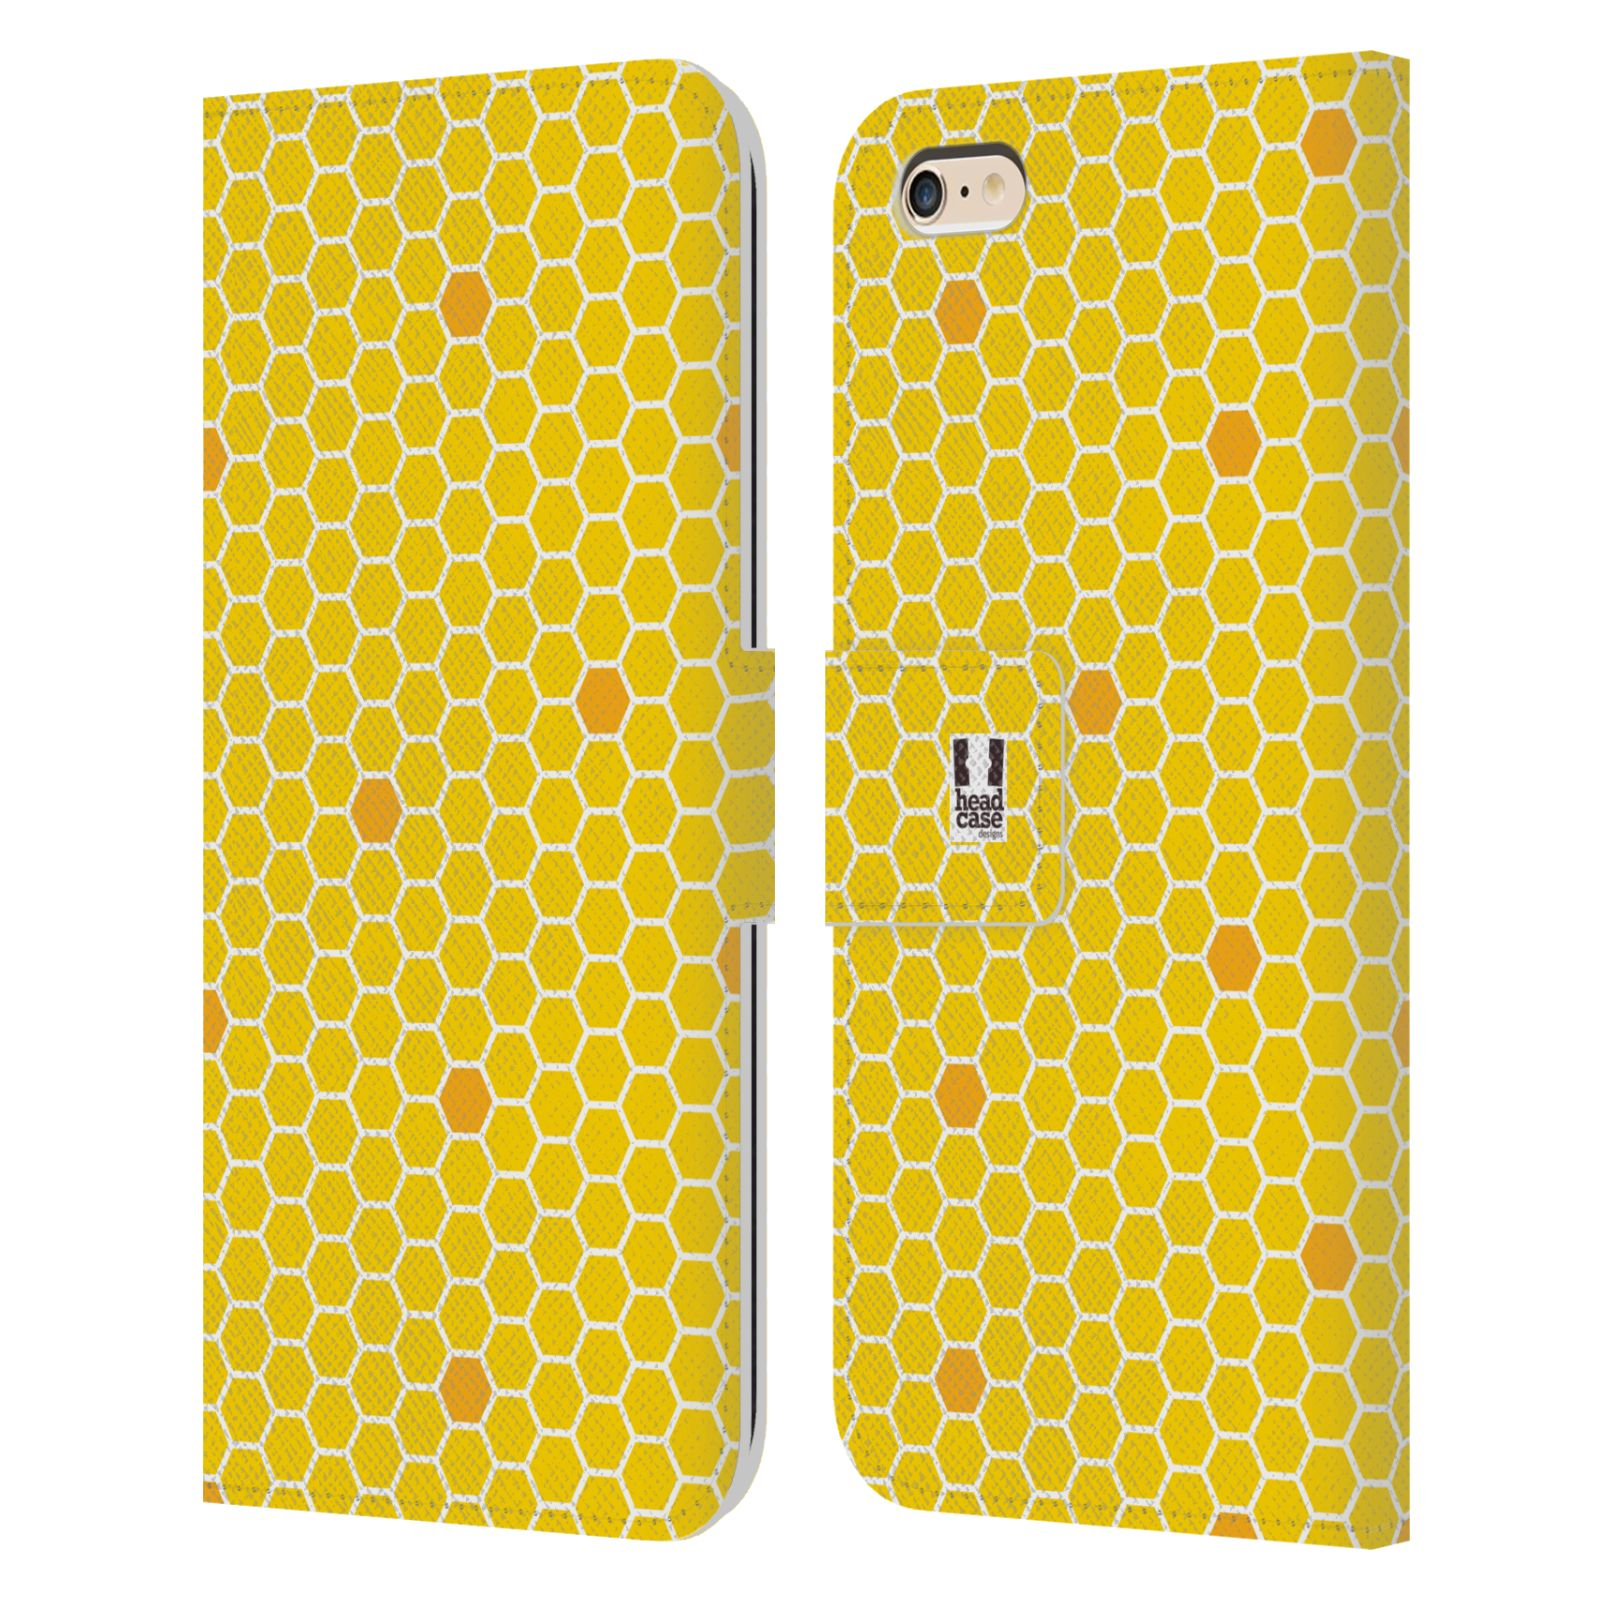 HEAD CASE Flipové pouzdro pro mobil Apple Iphone 6 PLUS / 6S PLUS VČELÍ VZOR plástev žlutá